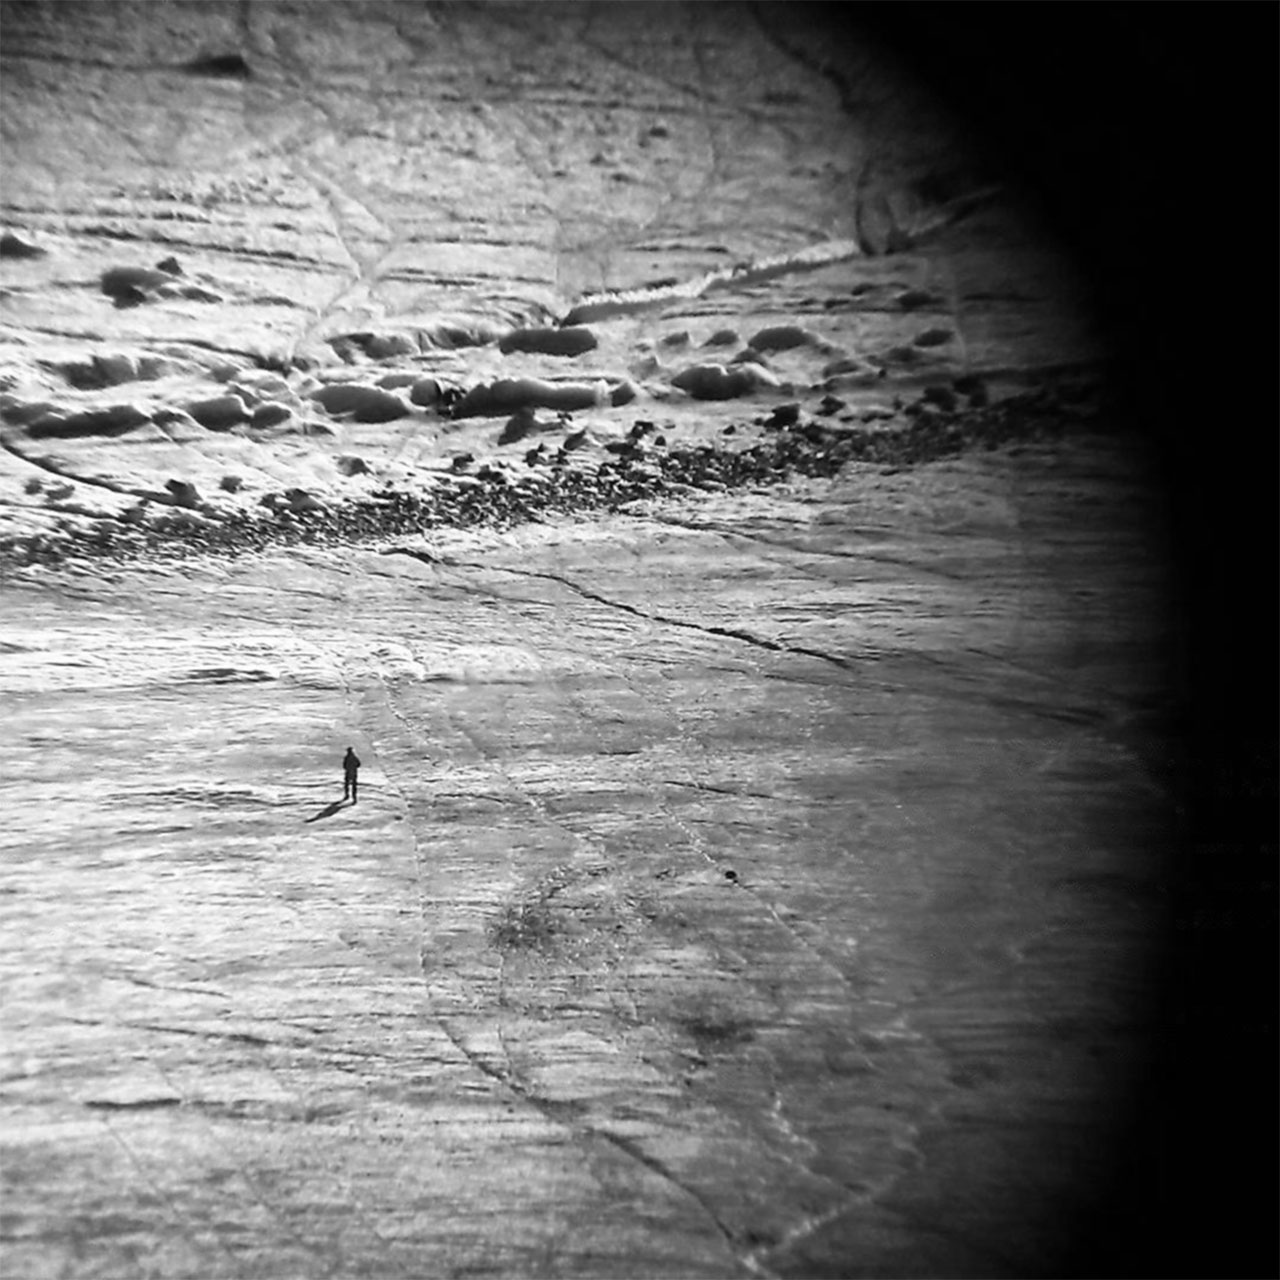 Sniper, © Matt Hulse, Edinburgh / UK, Free Choice / Conceptual Photography Category Winner, Felix Schoeller Photo Award